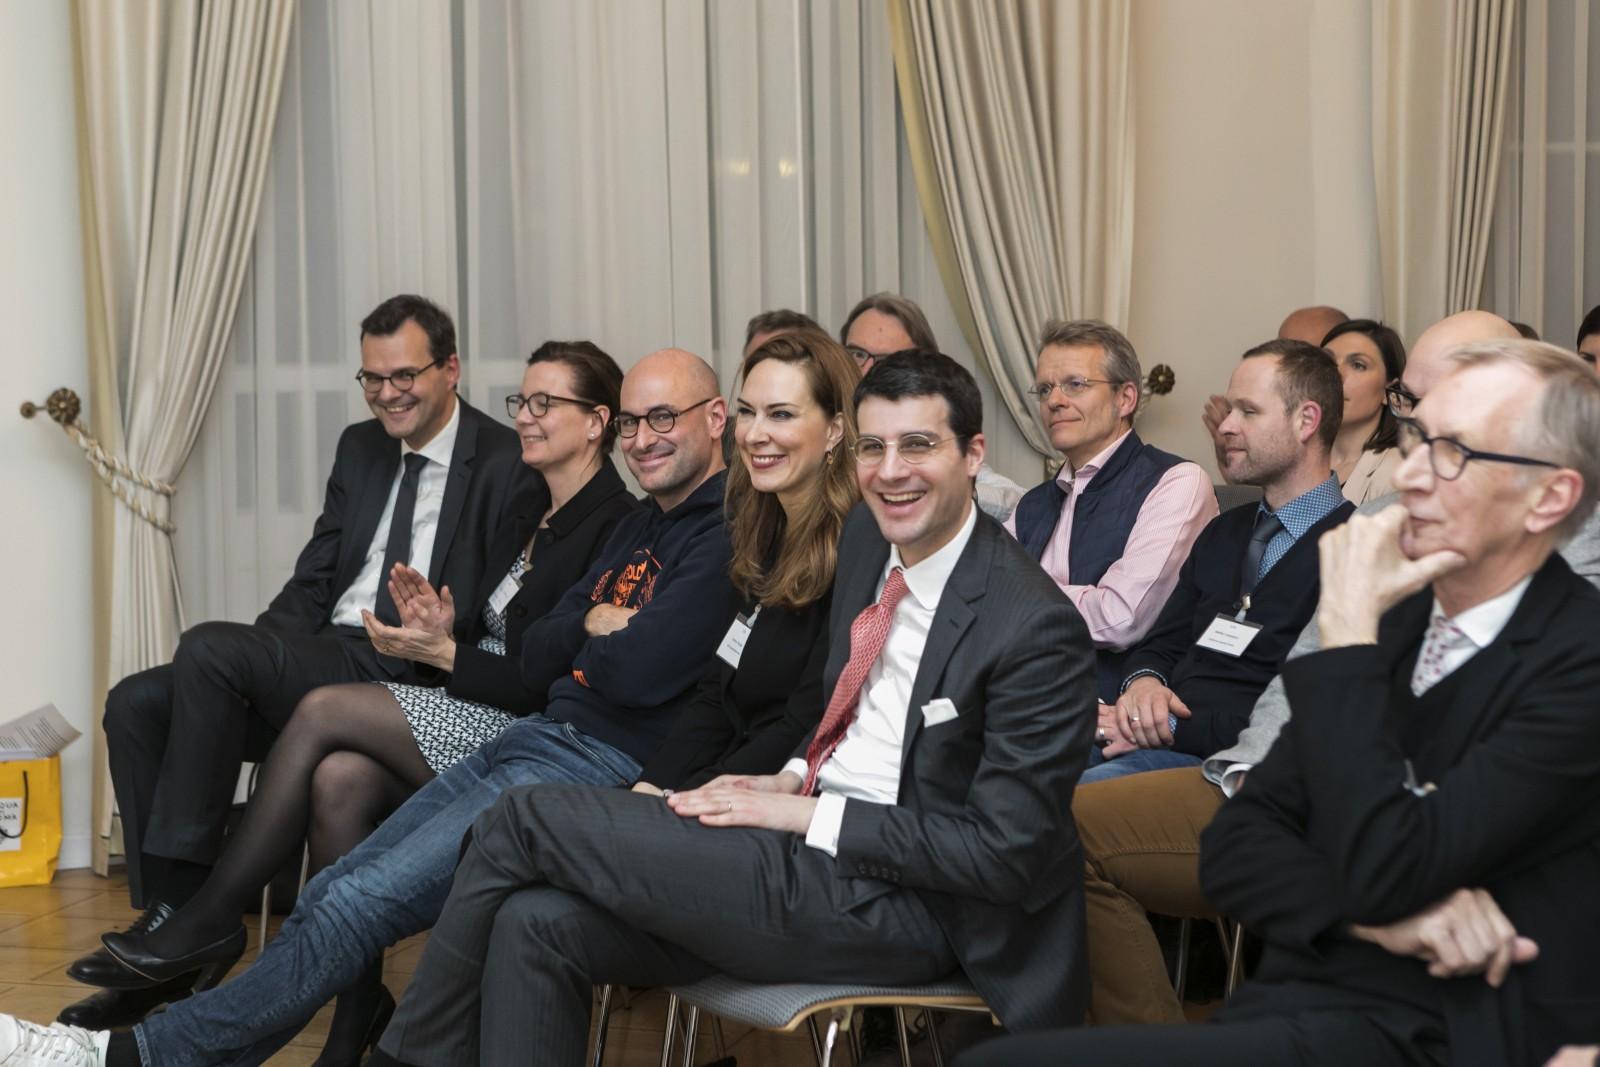 Dr. Klaus Driever, Allianz Deutschland; Angela Kesselring, SZ Scala; Dr. Dominik Wichmann, Looping Group; Anina Veigel, VZB; Dr. Marc Al-Hames, Cliqz